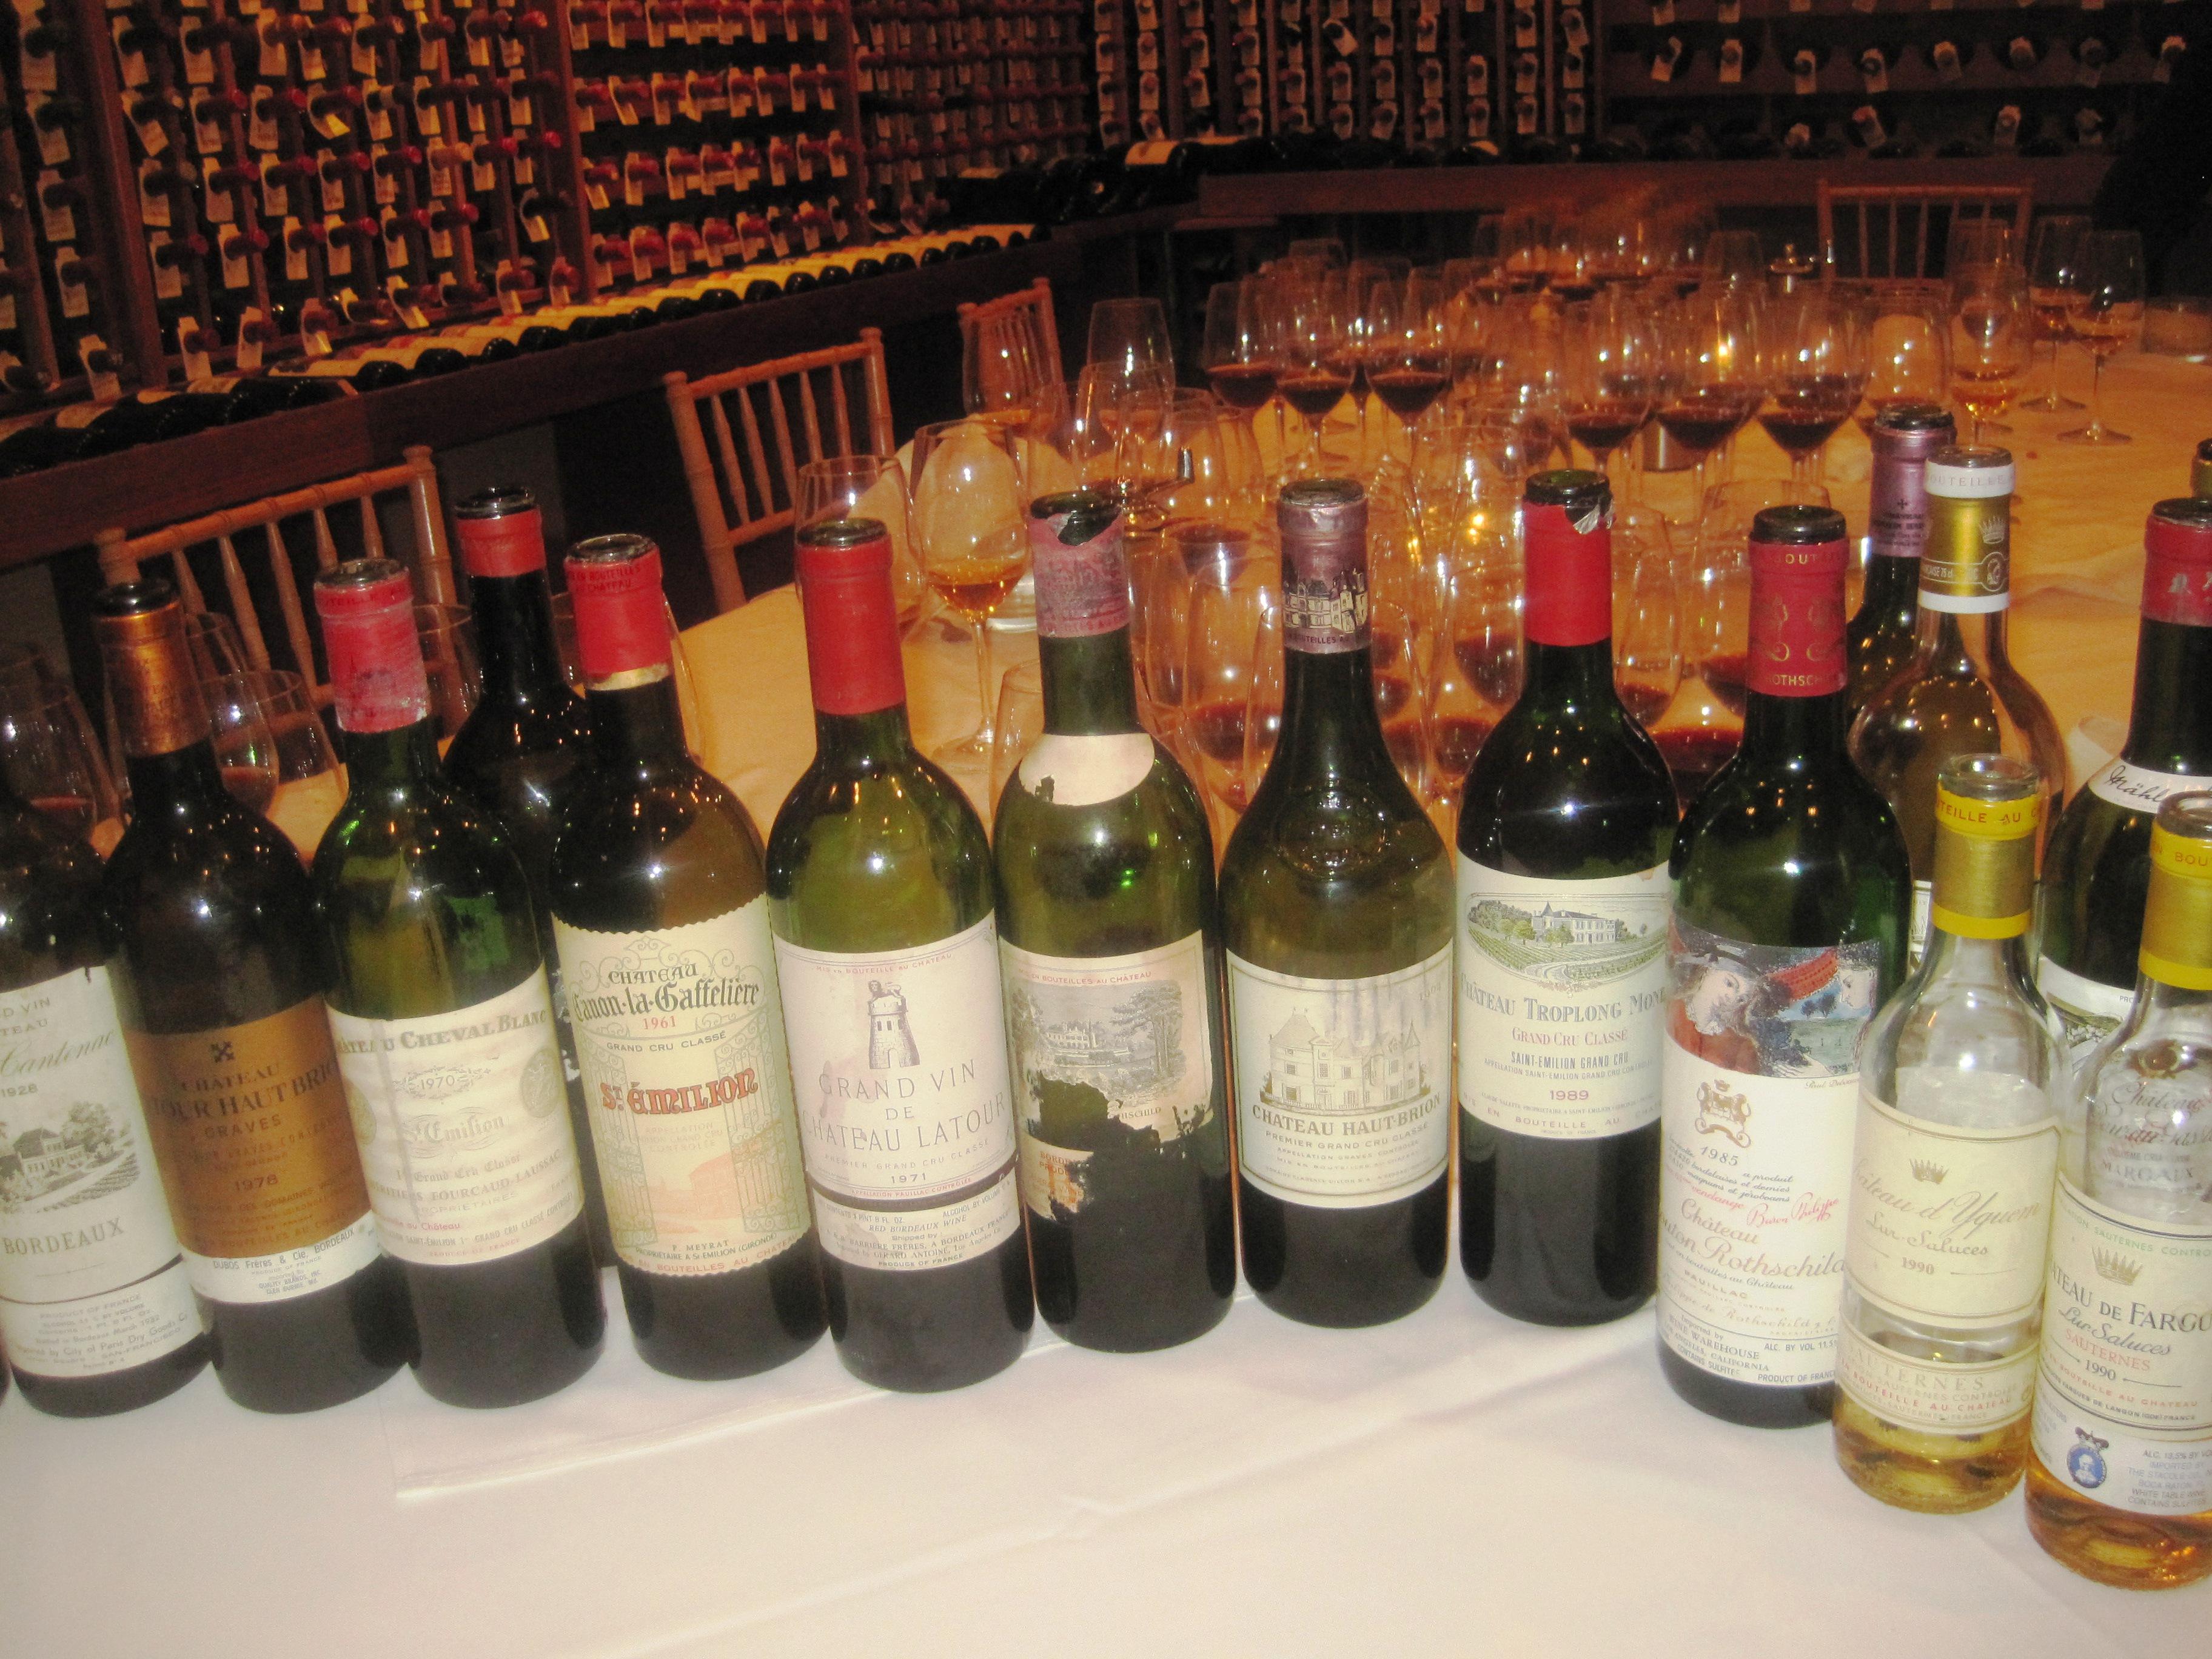 7 Blind decades bottles